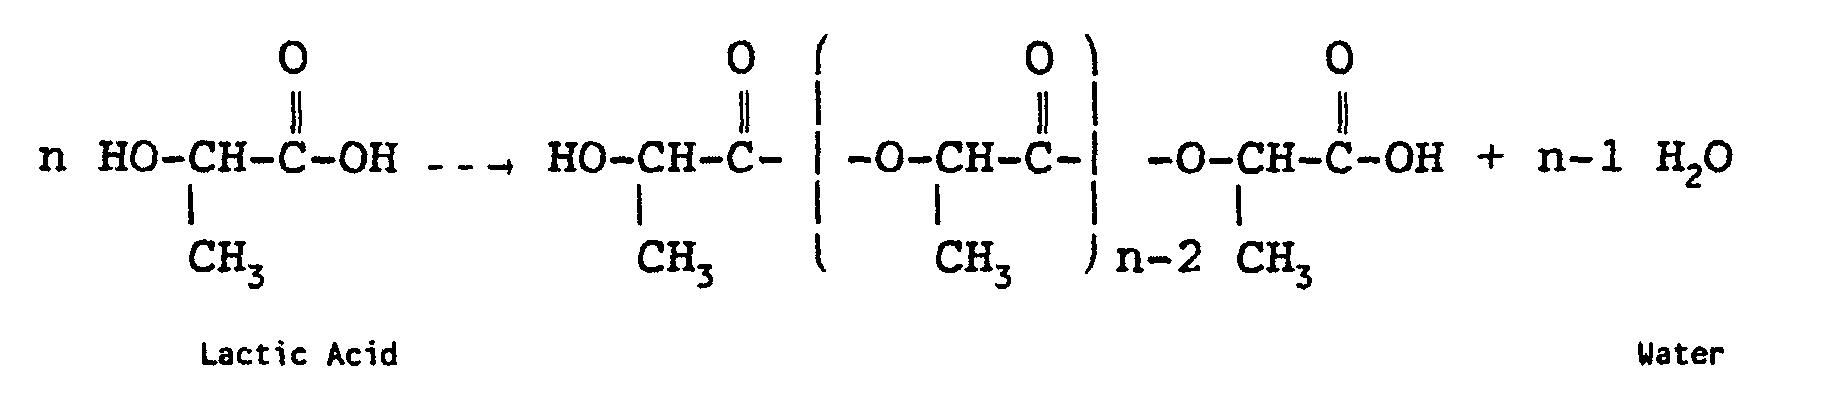 how to make polylactic acid